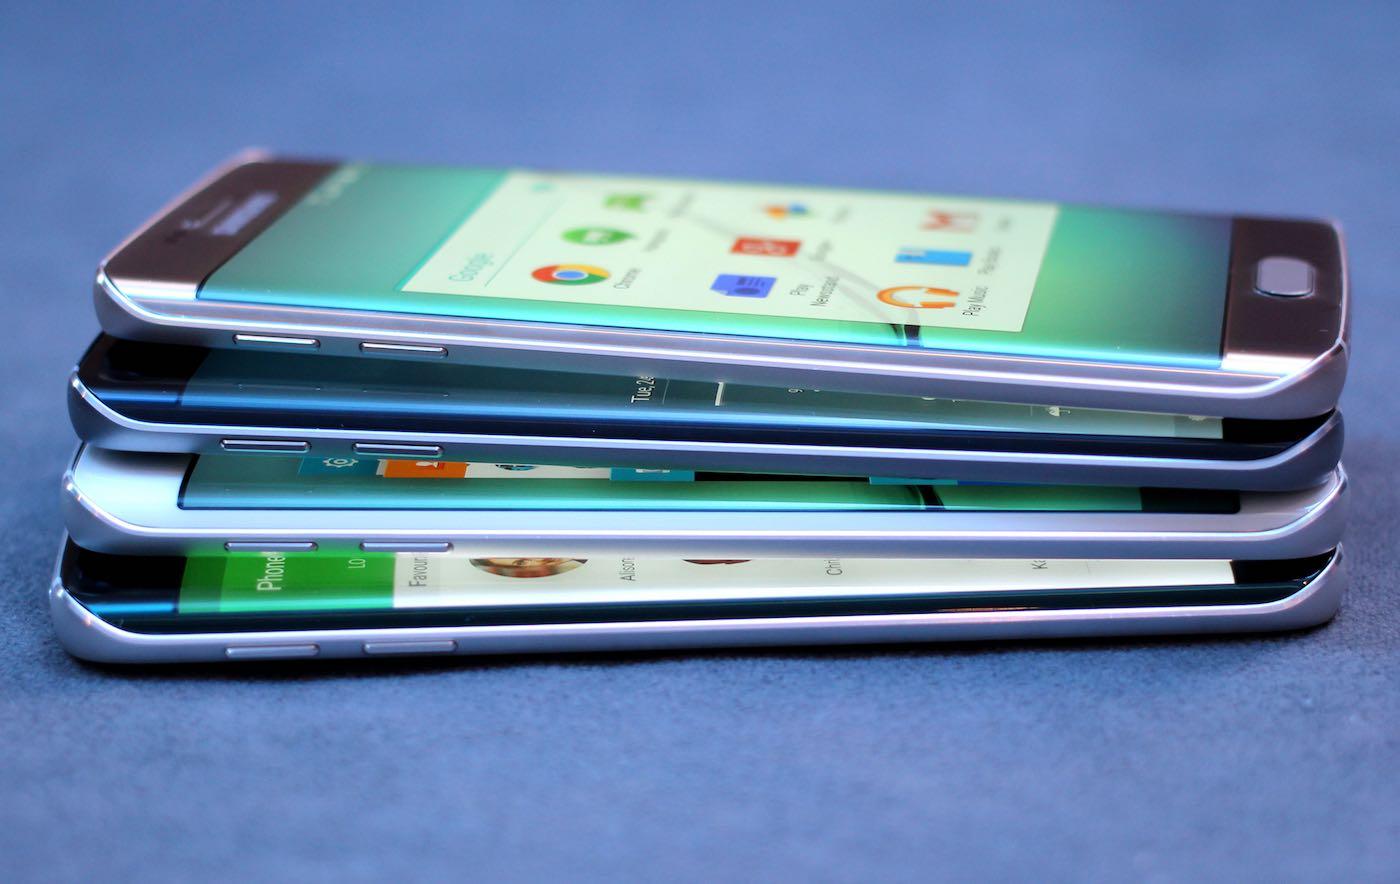 Samsung Galaxy Note 7 Galaxy S7 edge